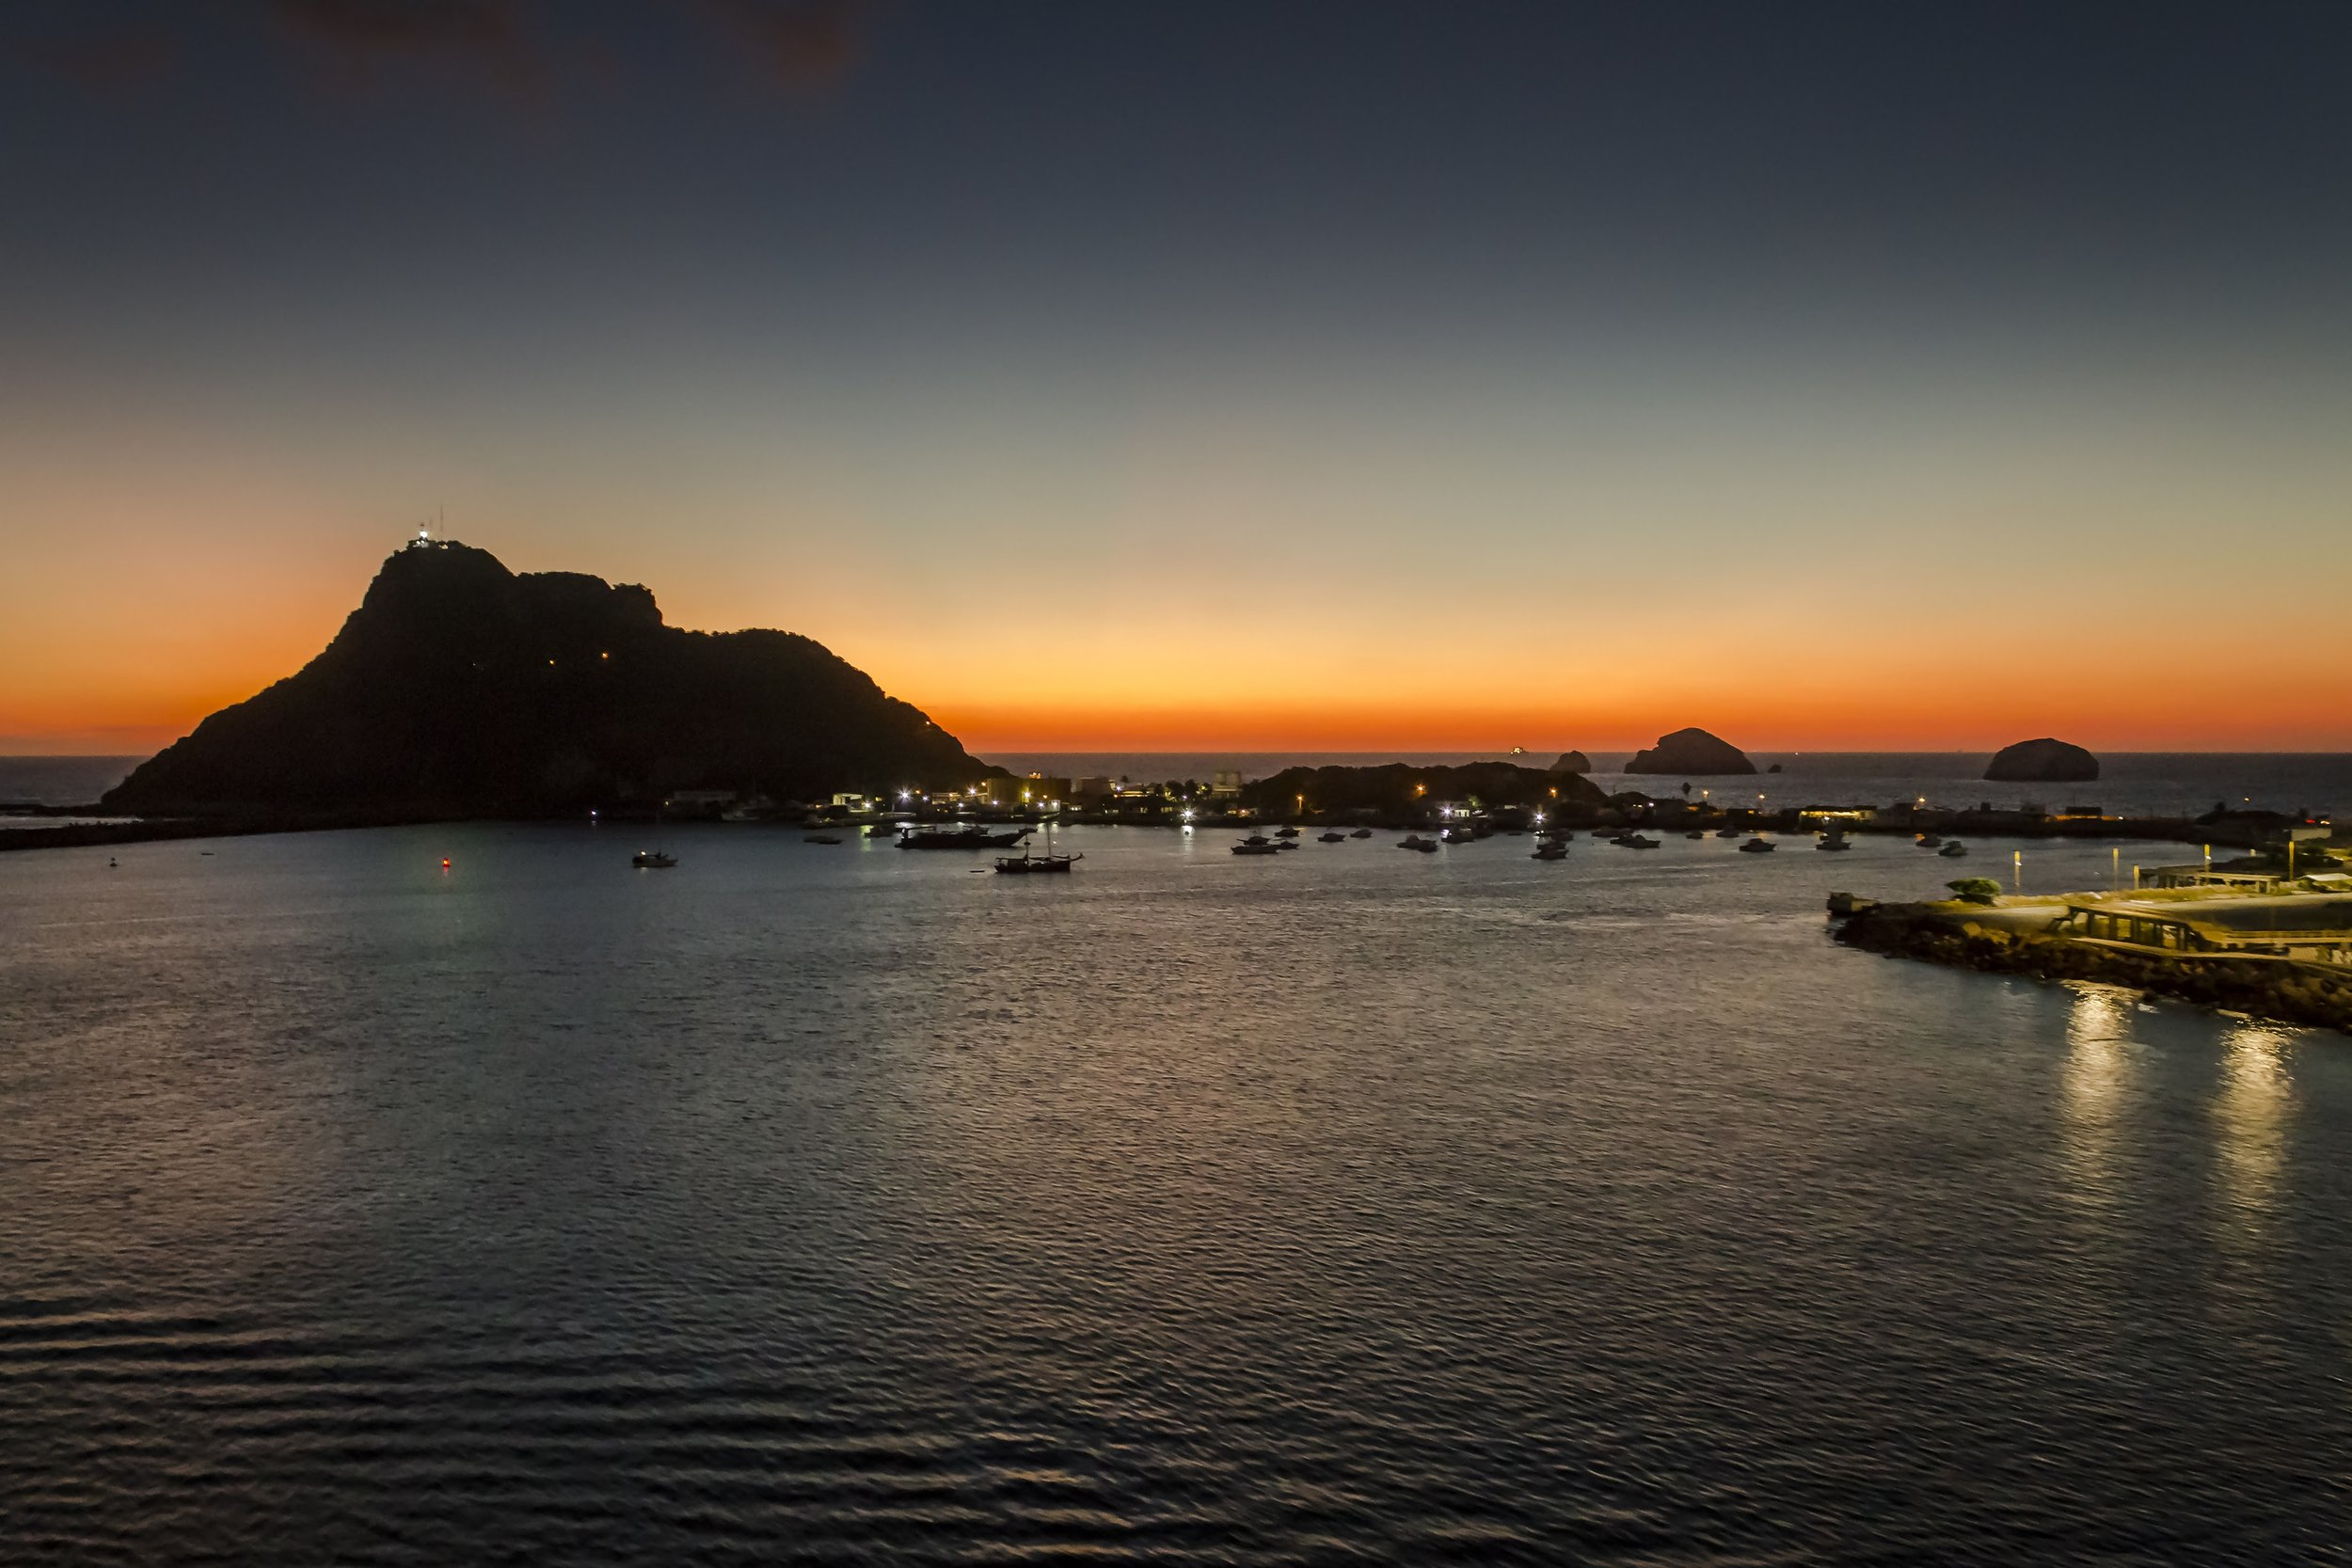 Port for cruise ships in Mazatlan, Mexico